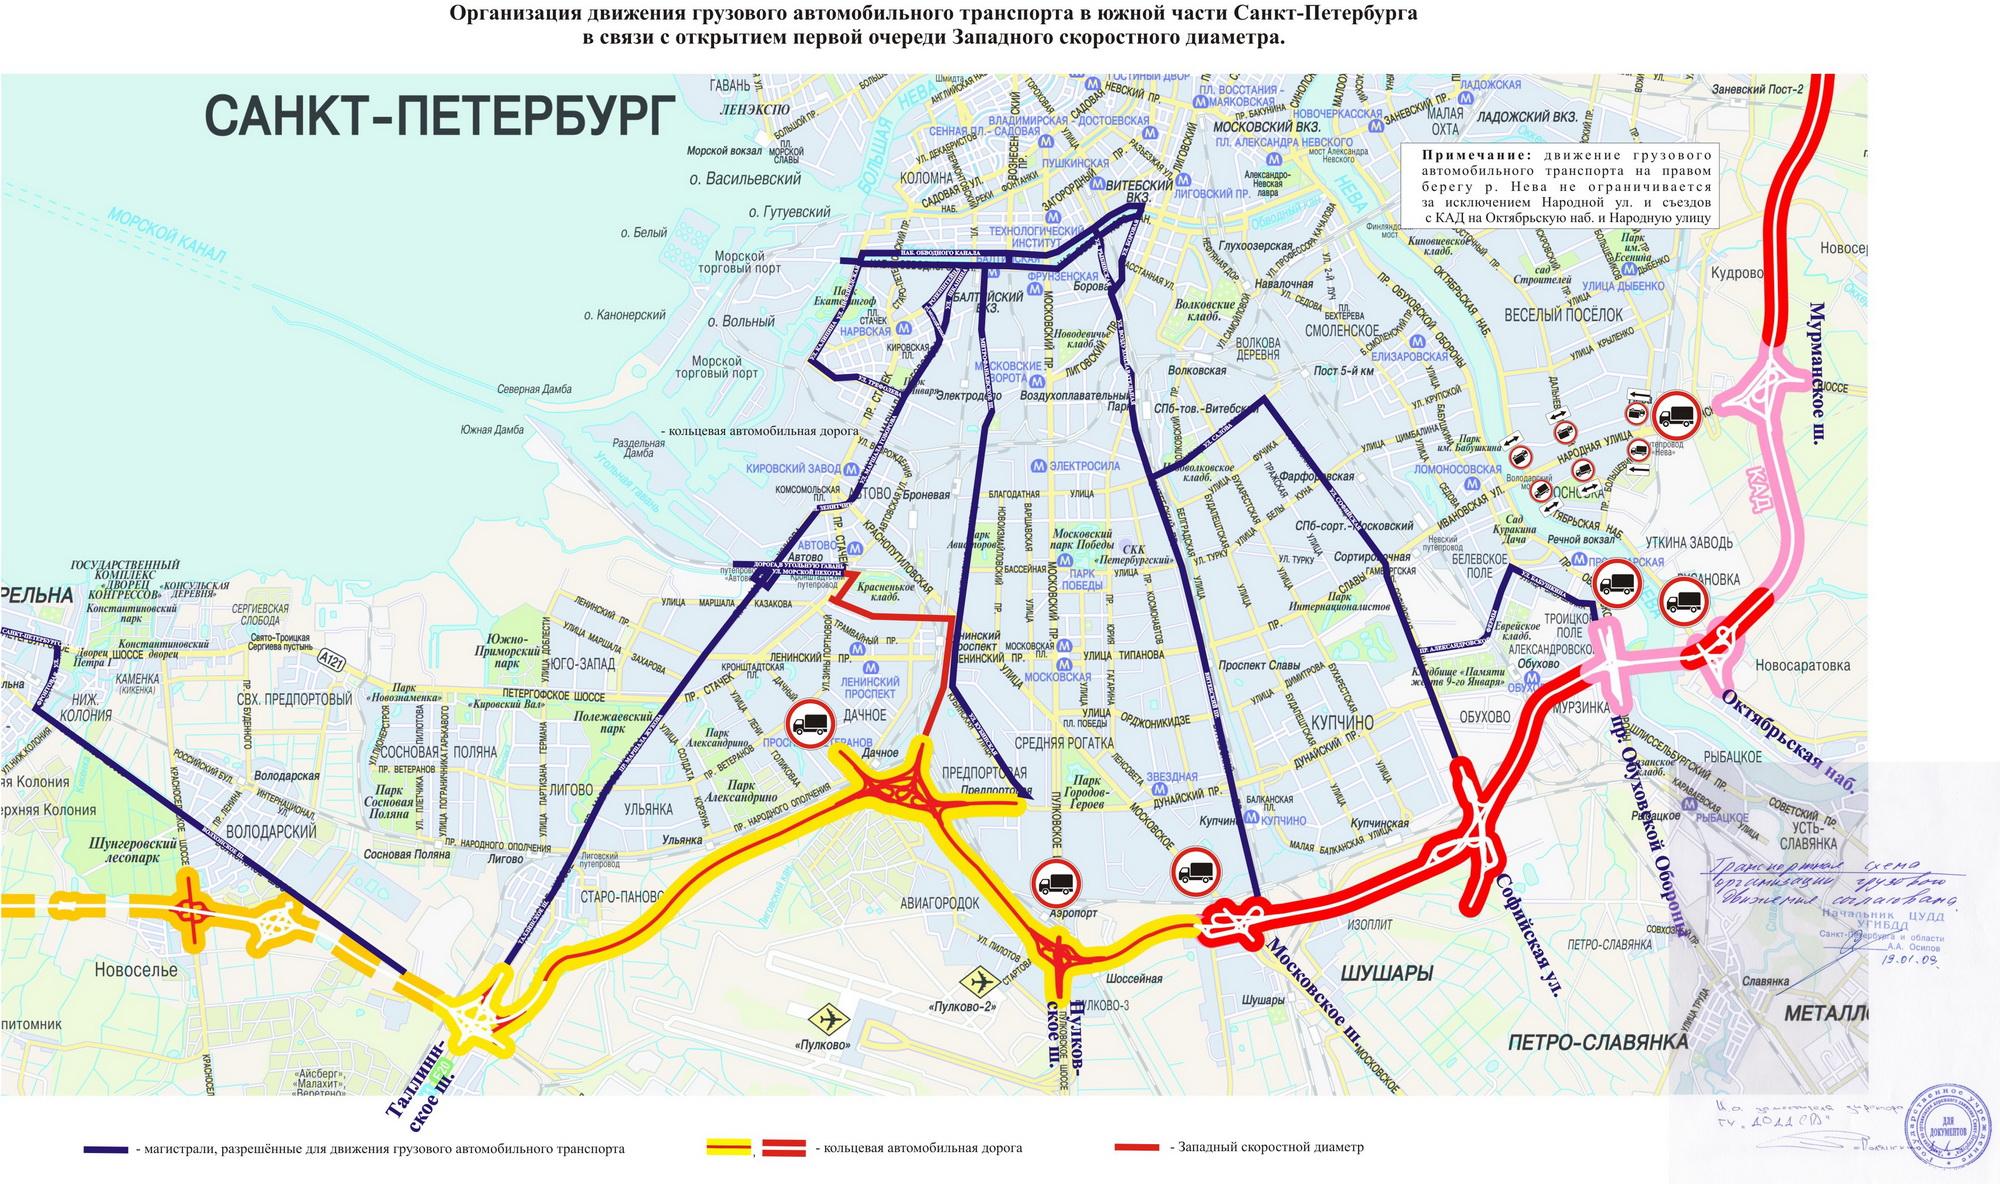 Схема проезда от иваново до санкт-петербурга